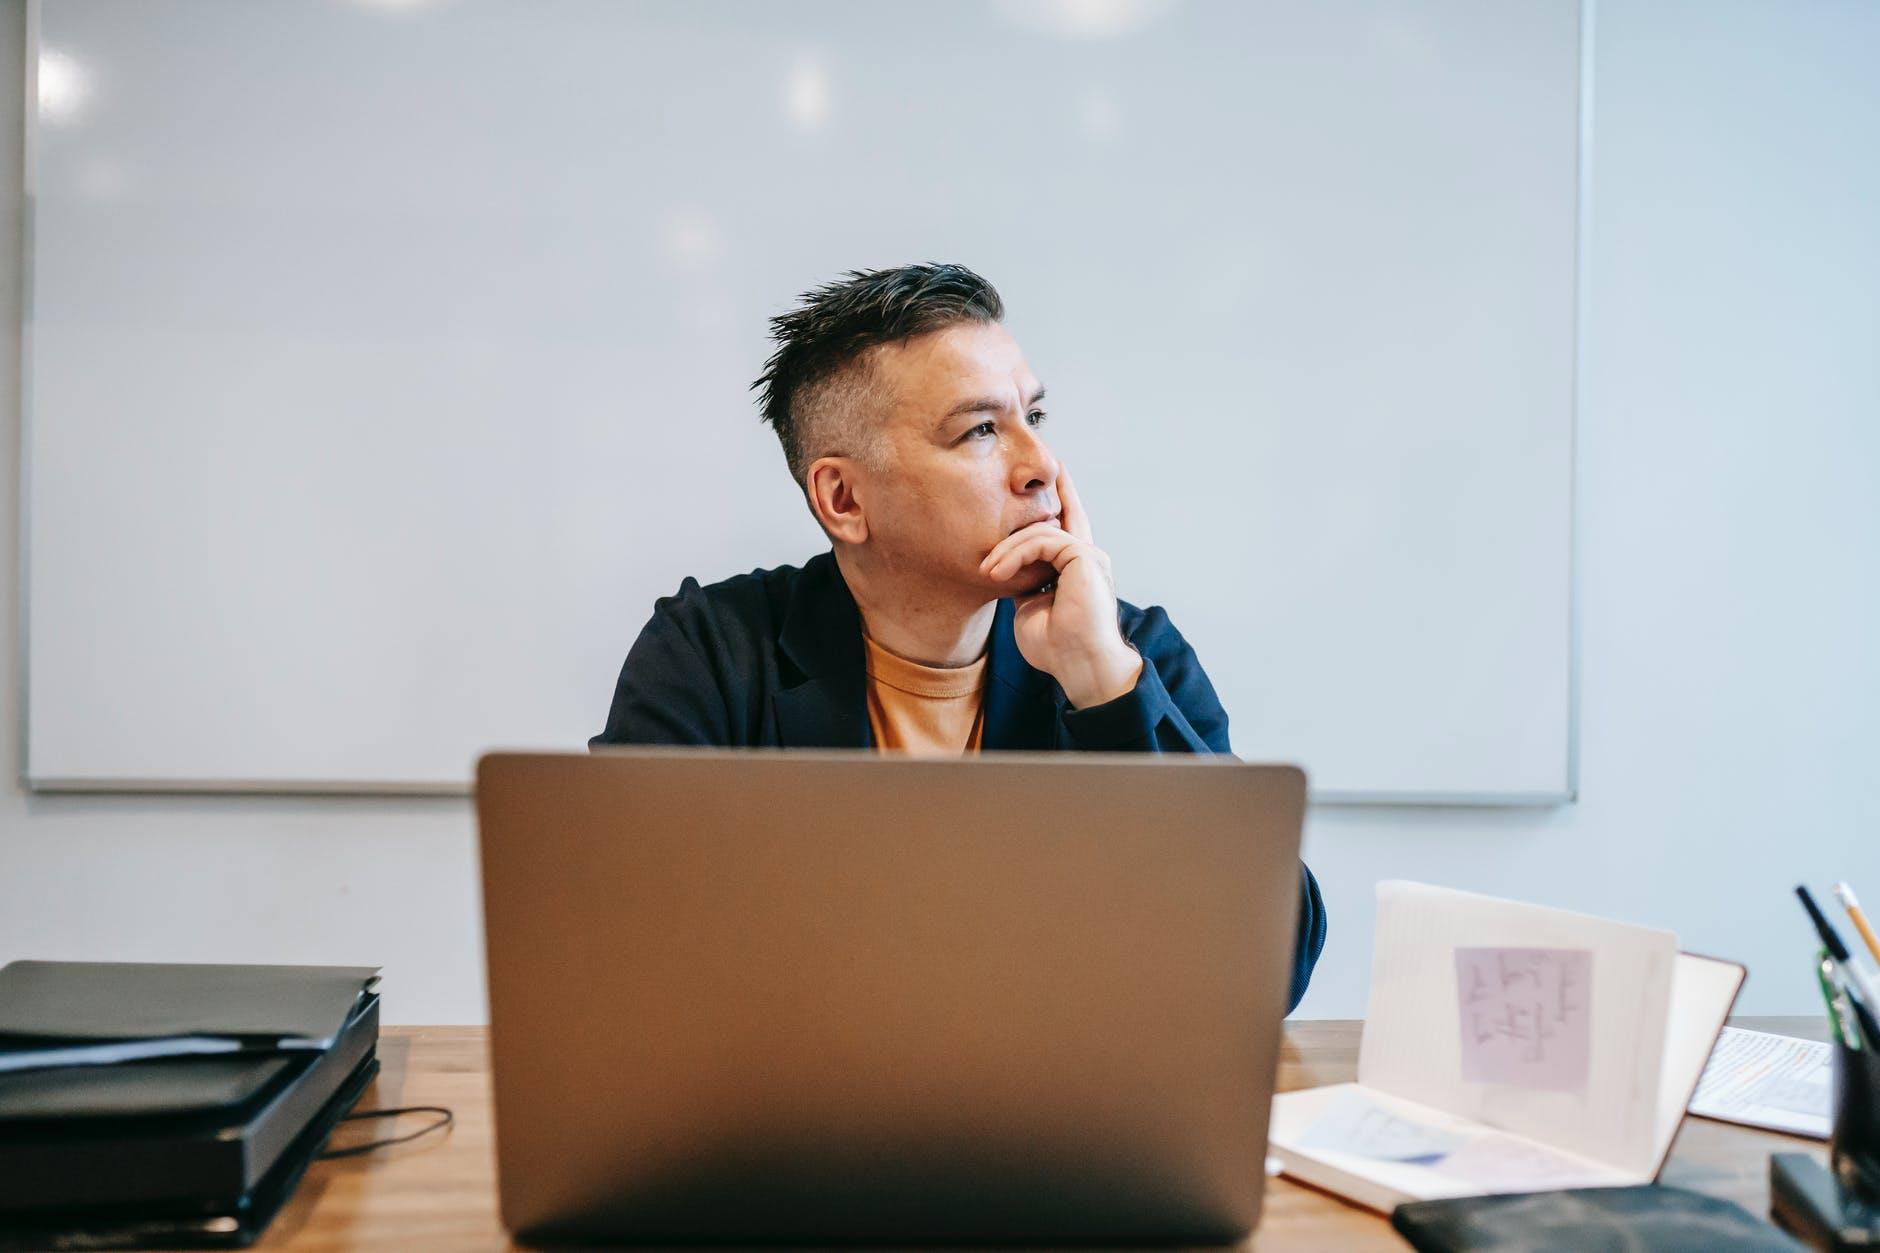 Hombre pensando frente al ordenador